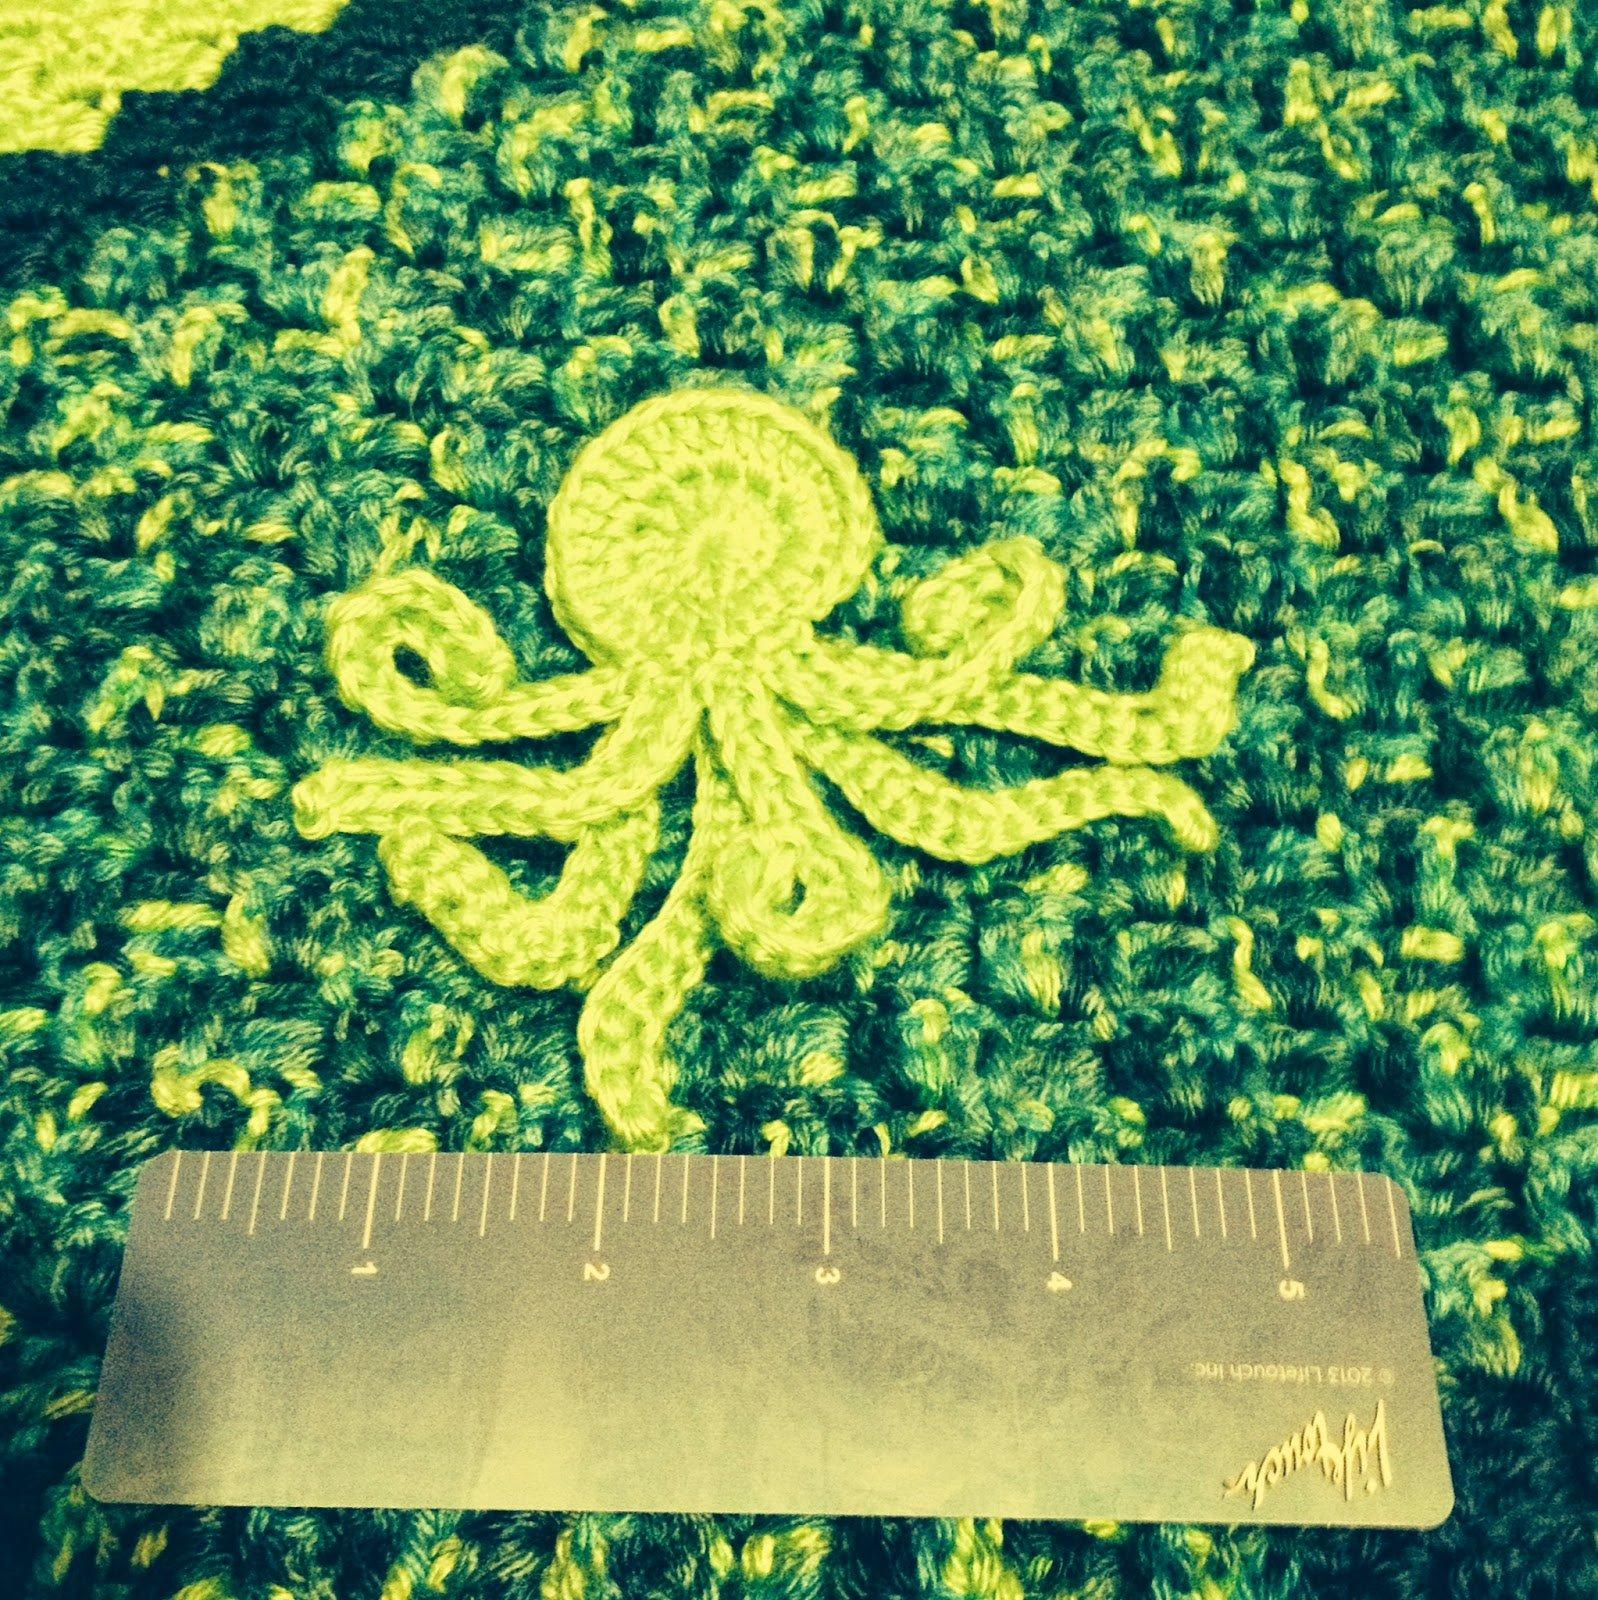 8 or 4 Legged Octopus Applique ~ Manda Proell - MandaLynn's Crochet Treasures